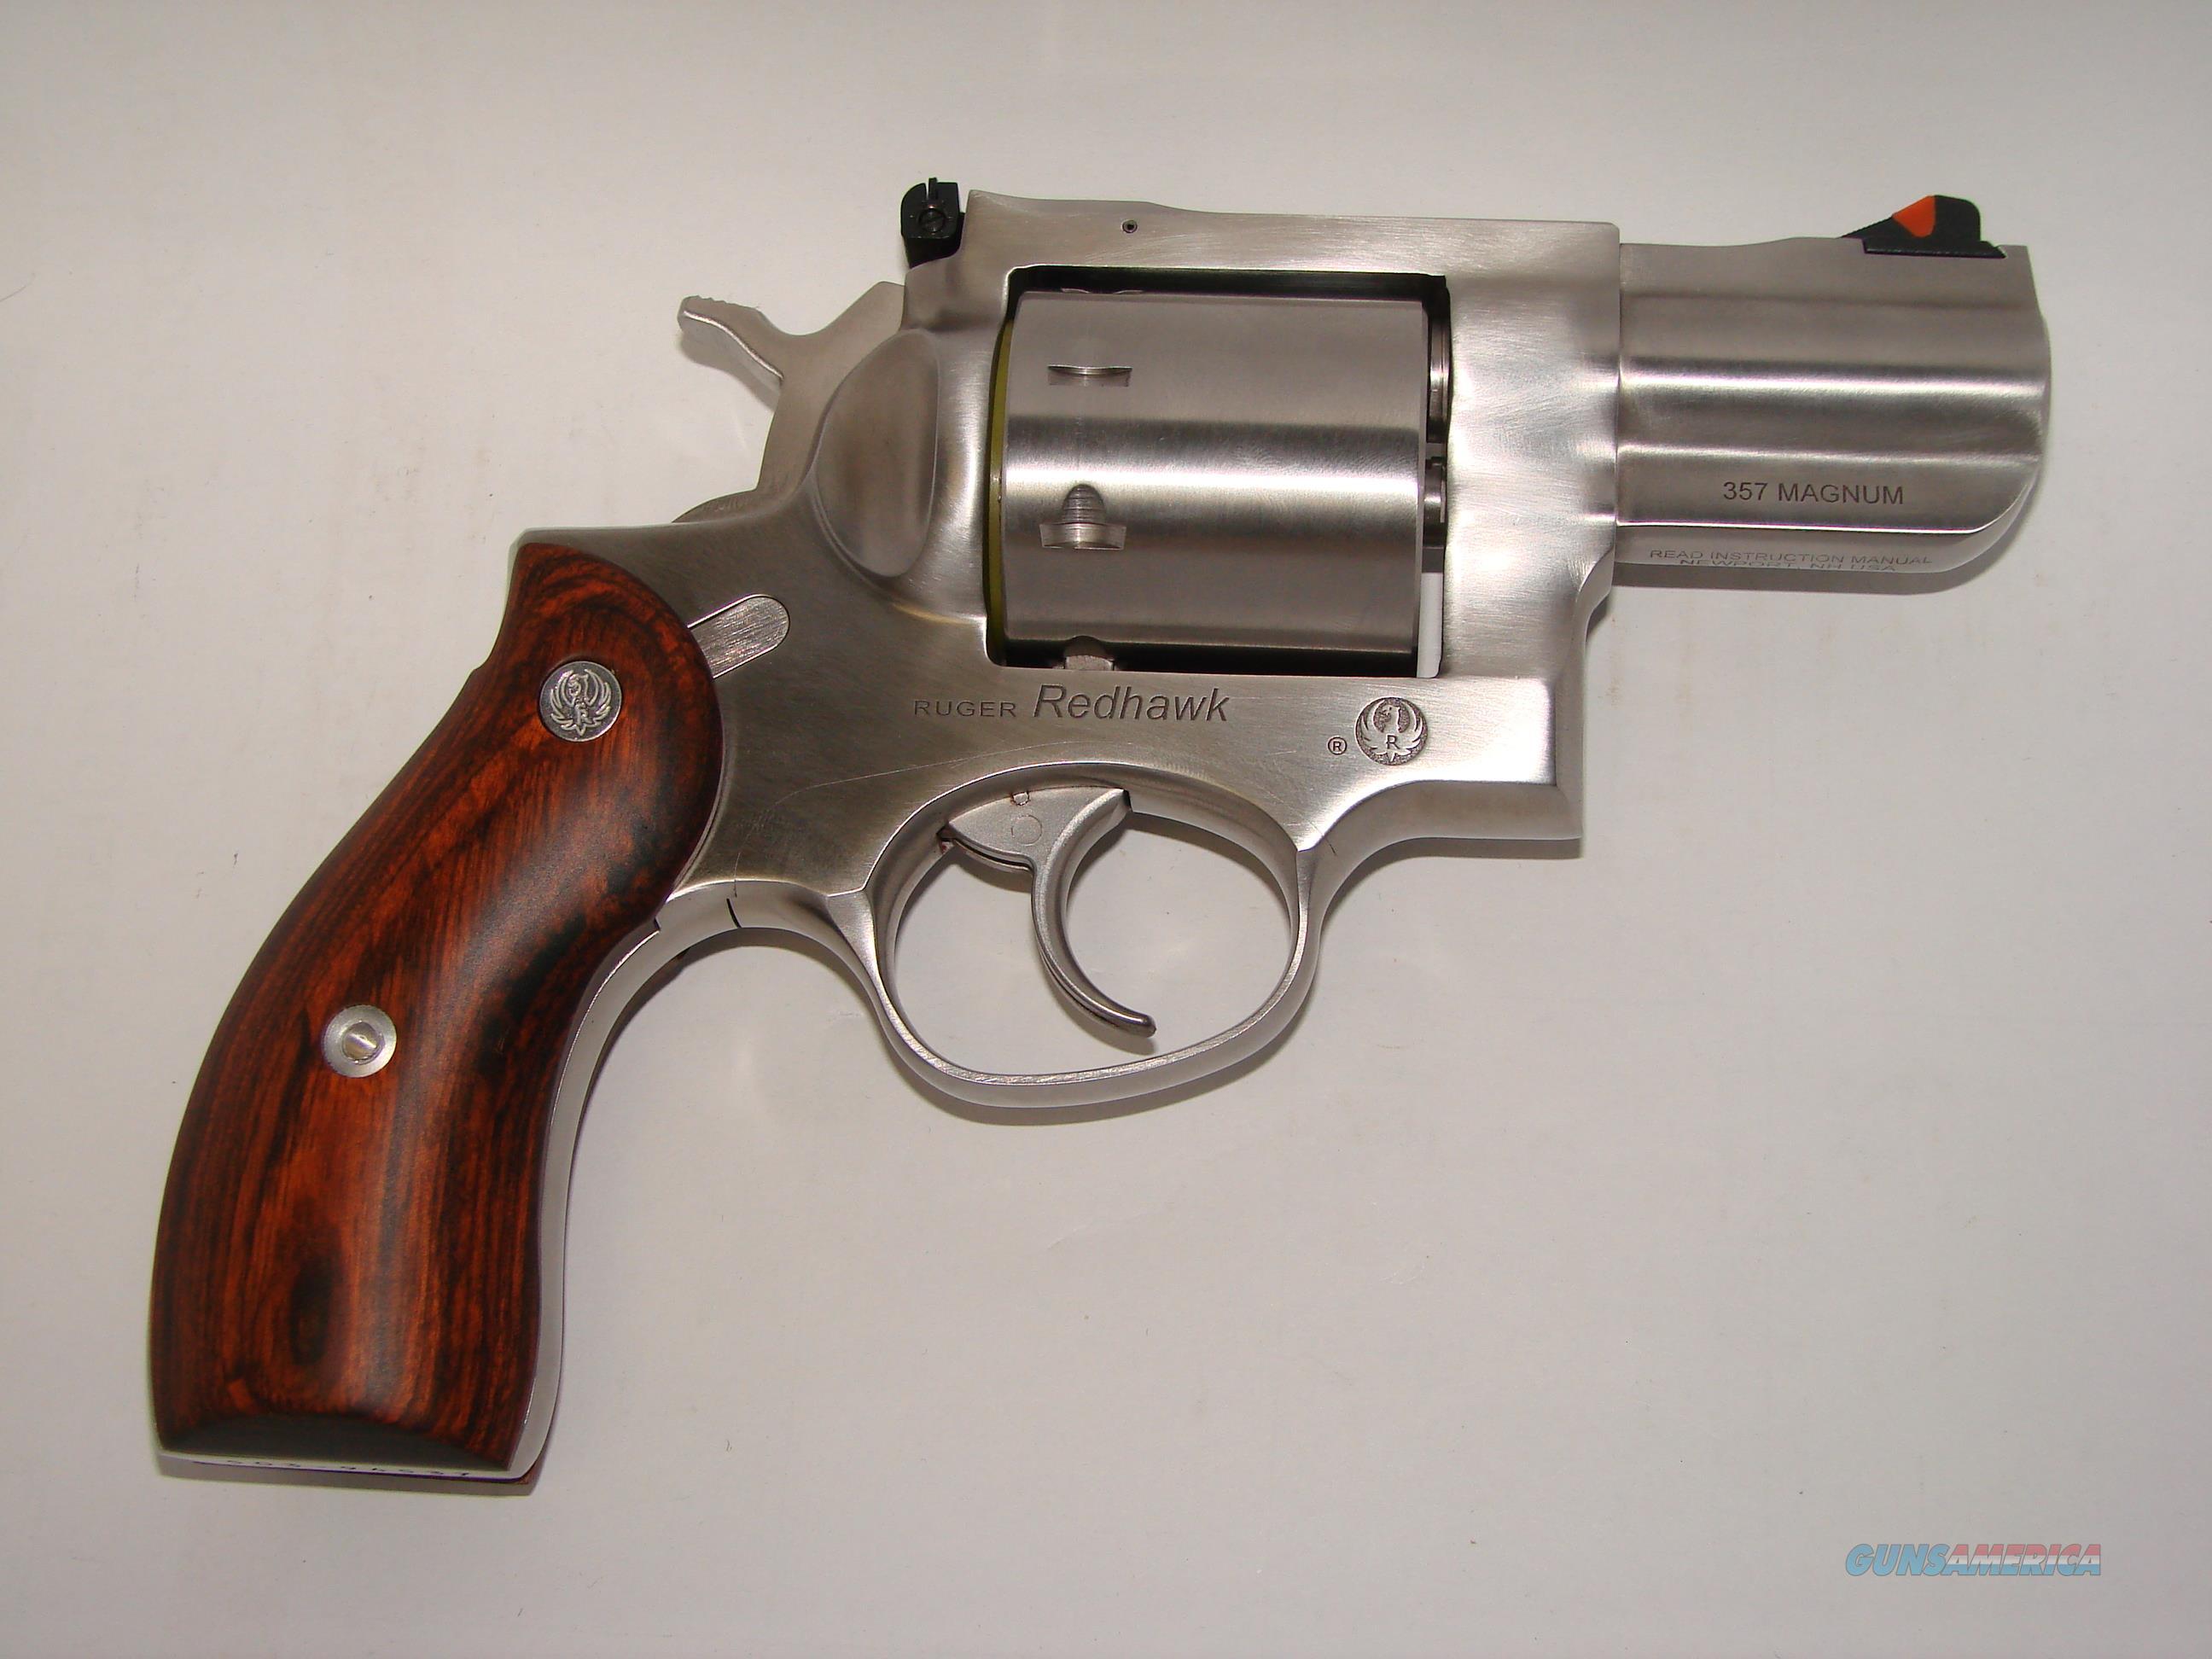 Ruger Redhawk 357Mag  Guns > Pistols > Ruger Double Action Revolver > Redhawk Type